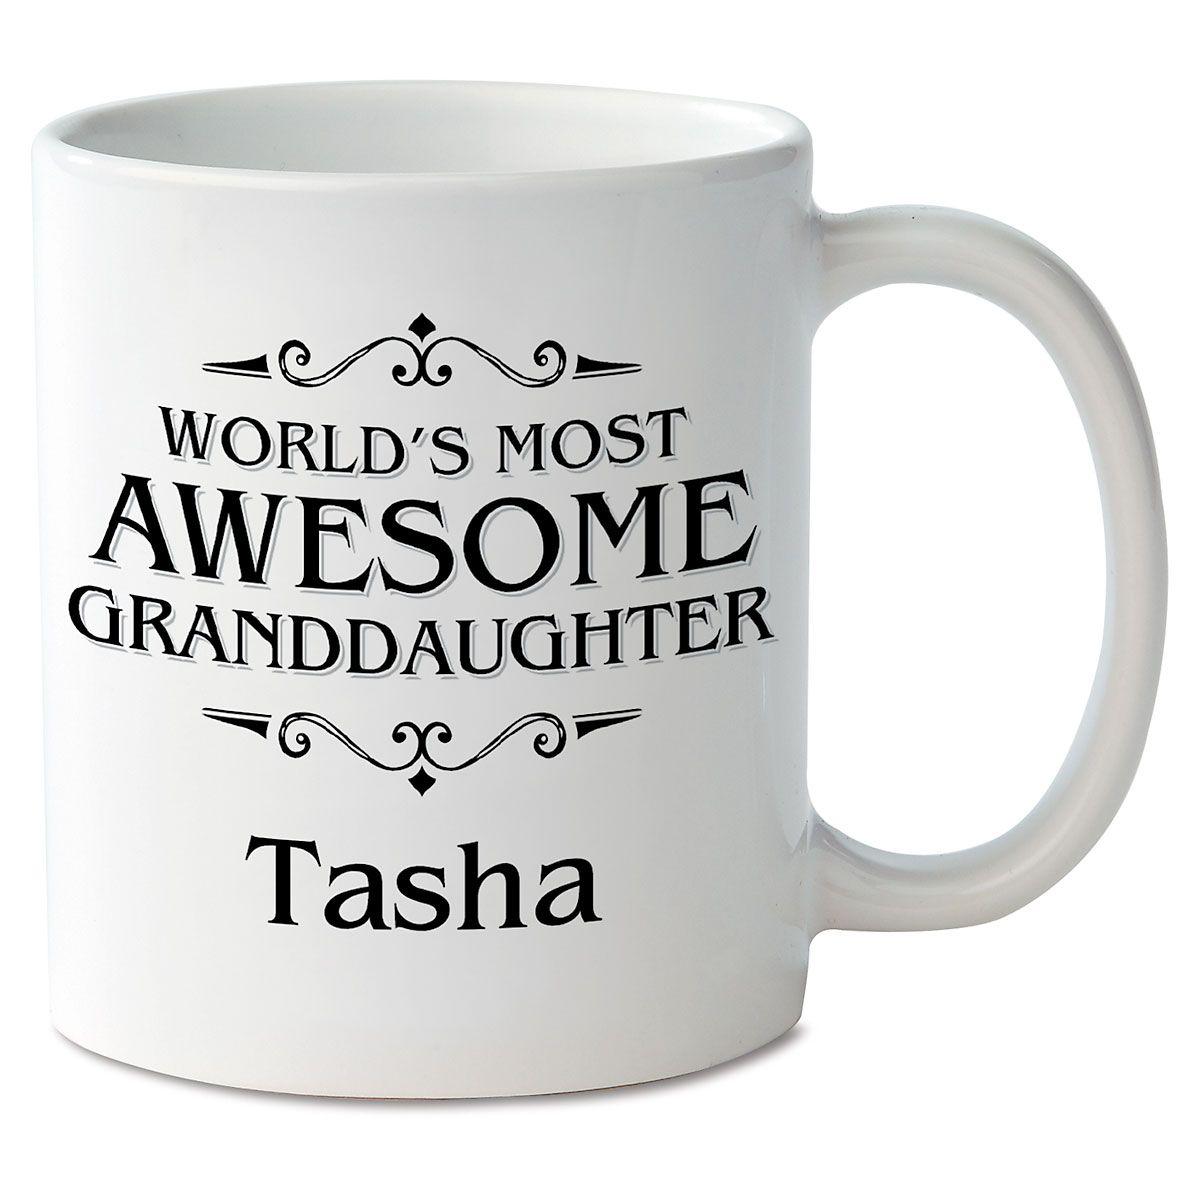 World's Most Awesome Granddaughter Novelty Mug